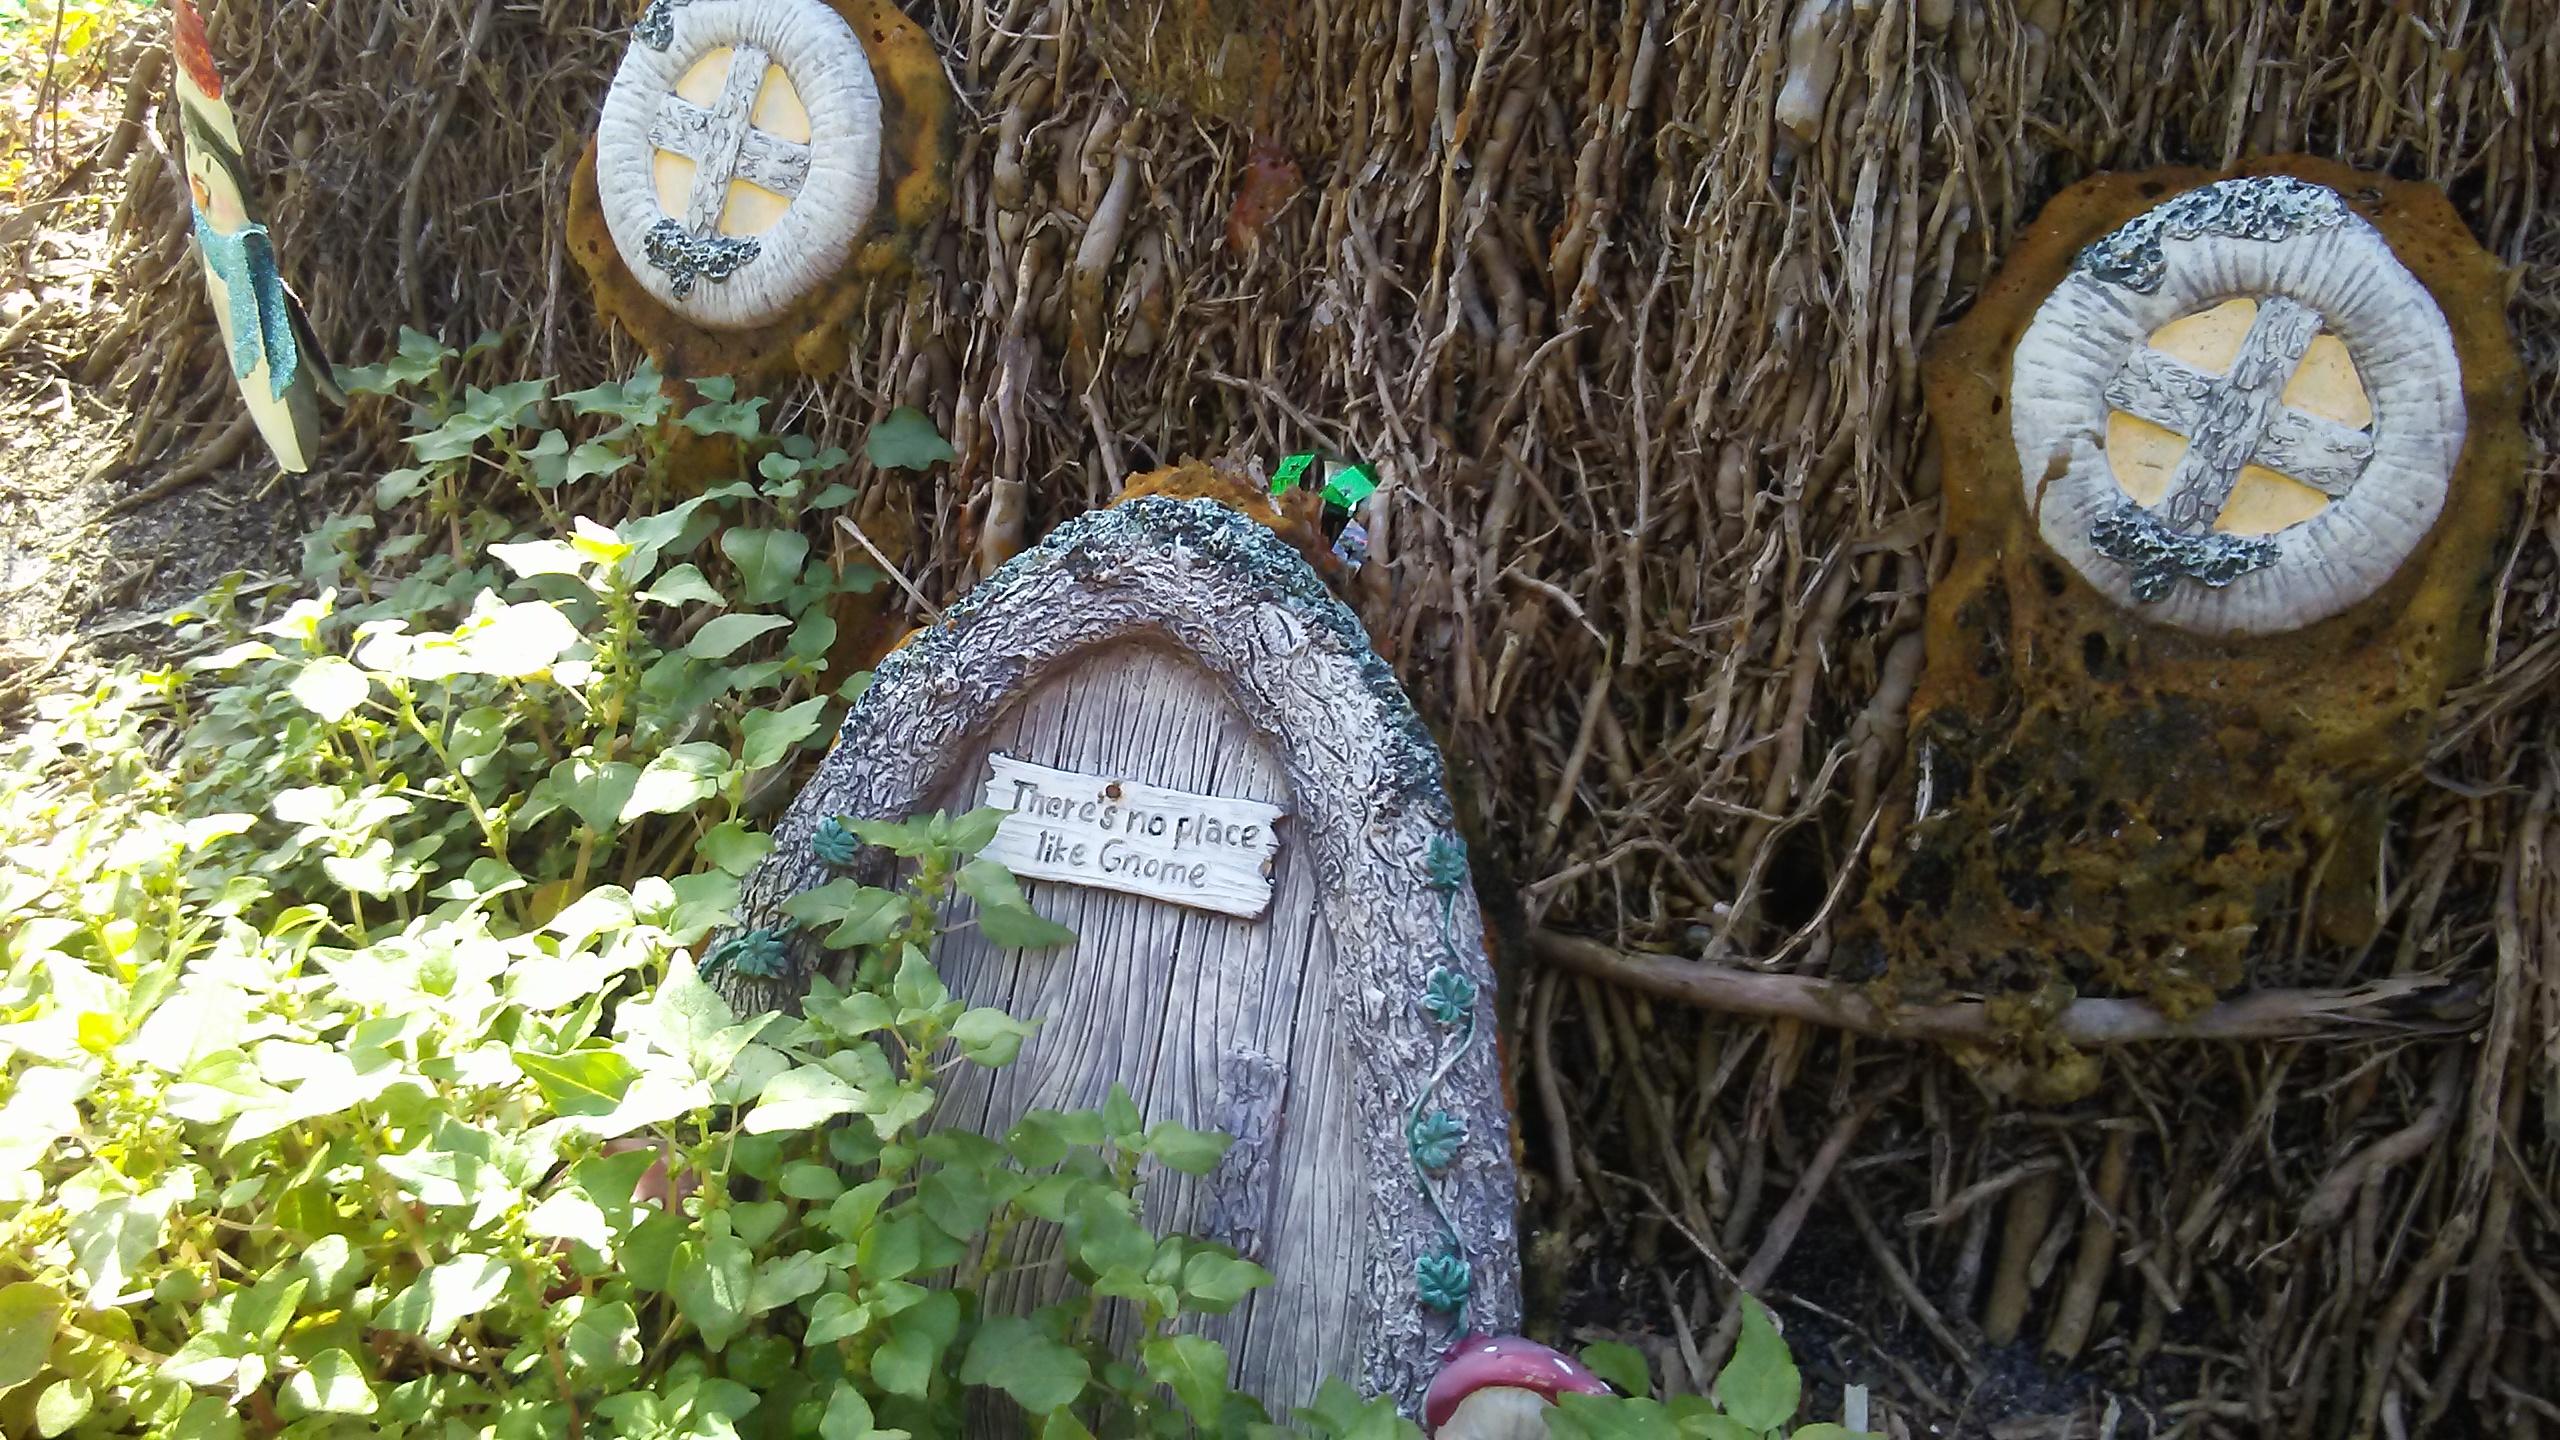 20190202_133207-jpg.48845_Gnome Village......!_Travel Stories_Squat the Planet_12:14 PM